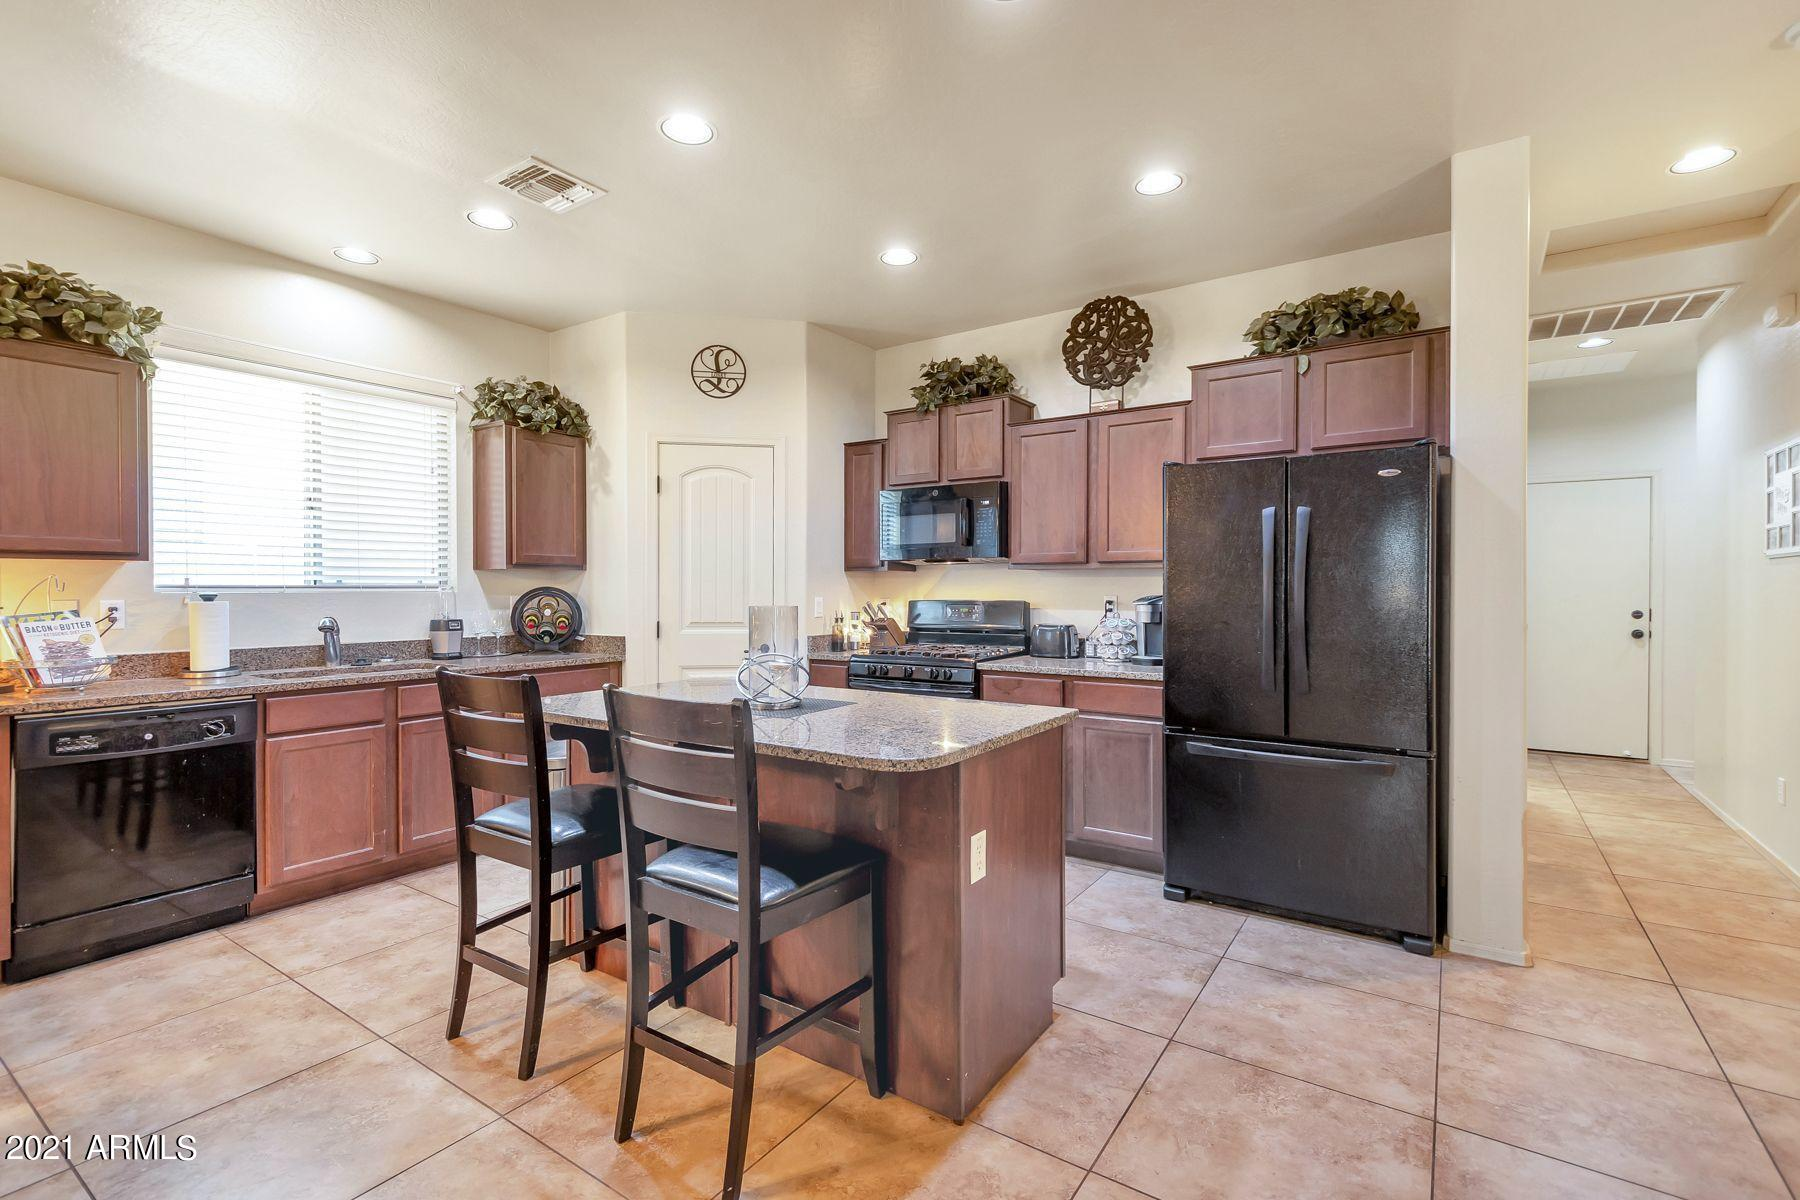 21871 215TH Street, Queen Creek, Arizona 85142, 3 Bedrooms Bedrooms, ,2 BathroomsBathrooms,Residential,For Sale,215TH,6243921